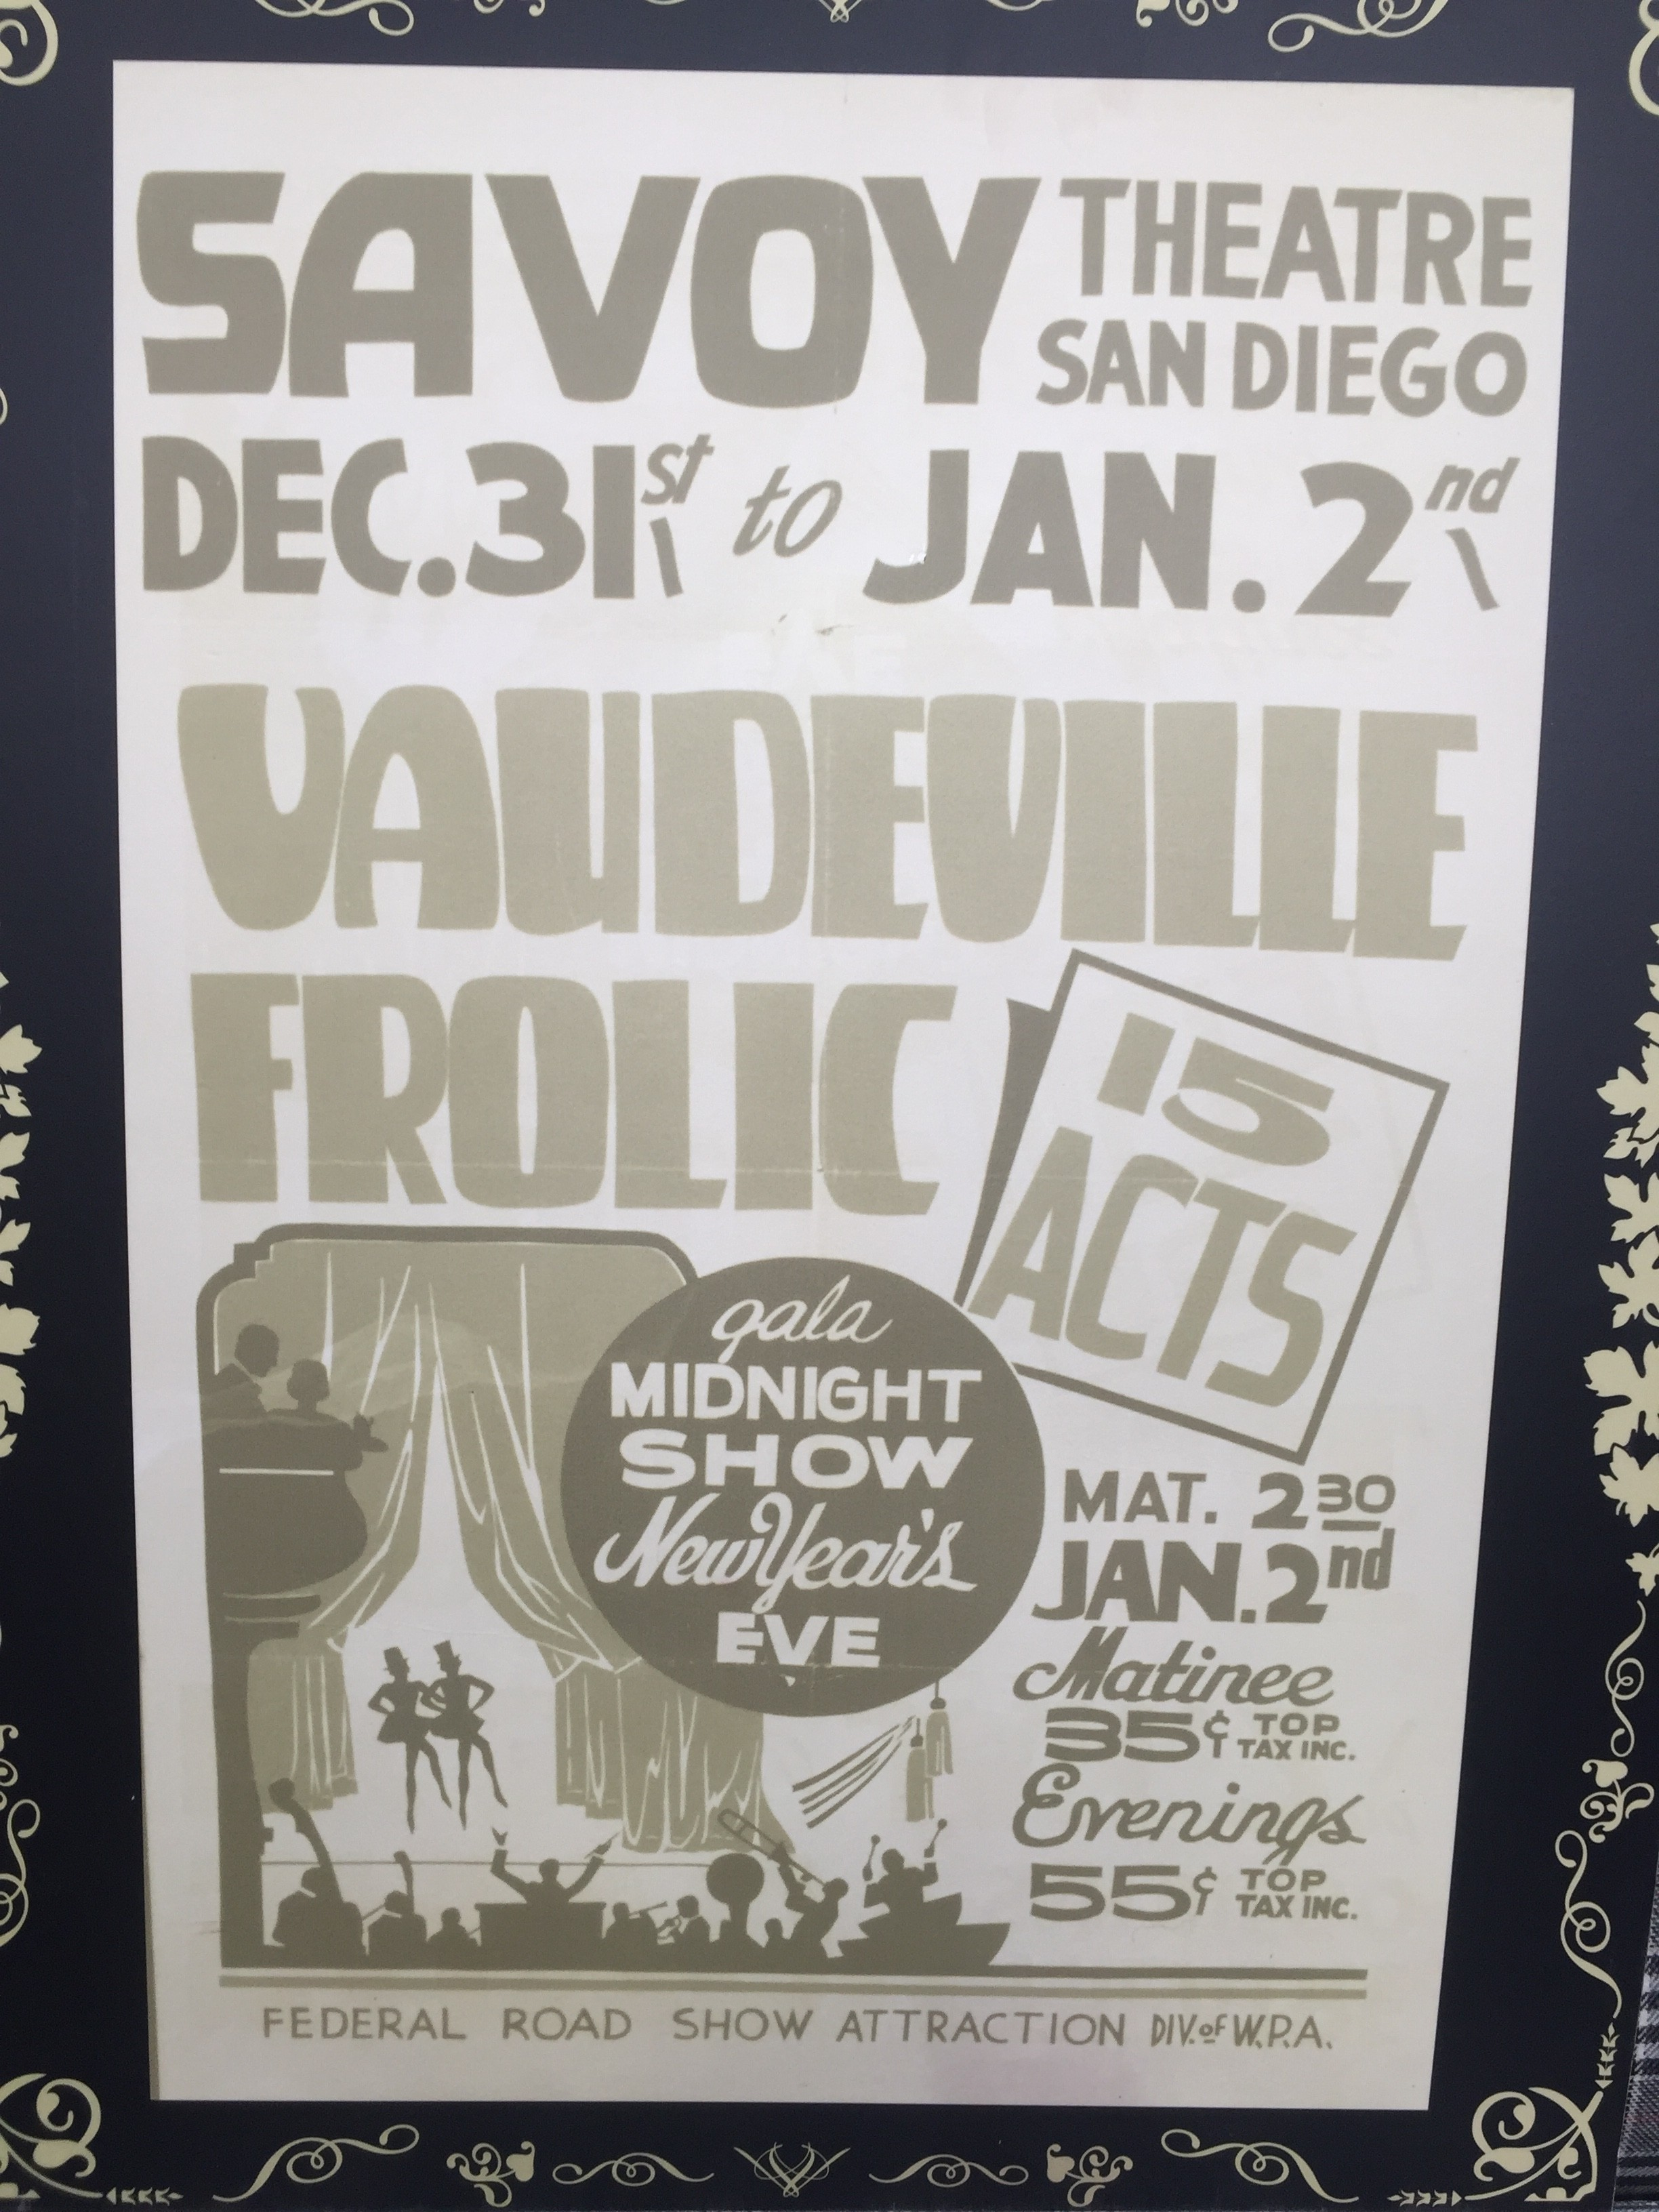 Large Photo Print Of Savoy Theatre San Diego Vaudeville